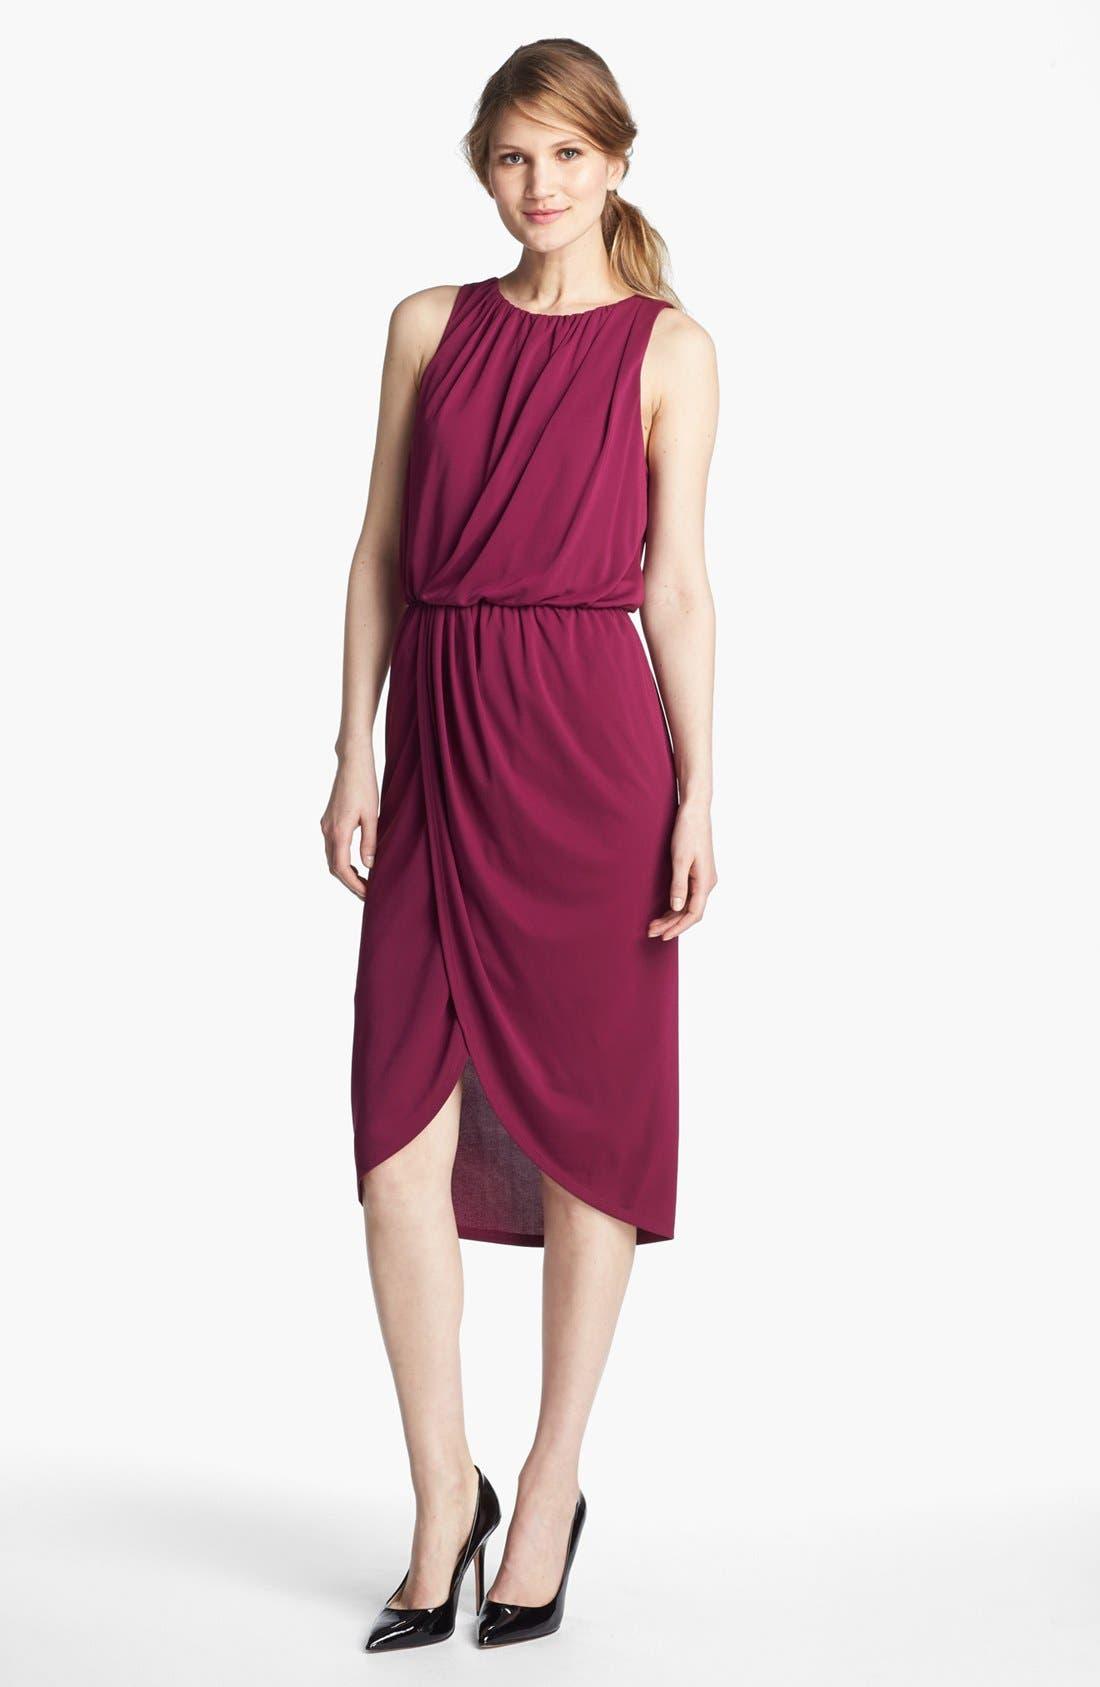 Main Image - Adrianna Papell Sleeveless Faux Wrap Dress